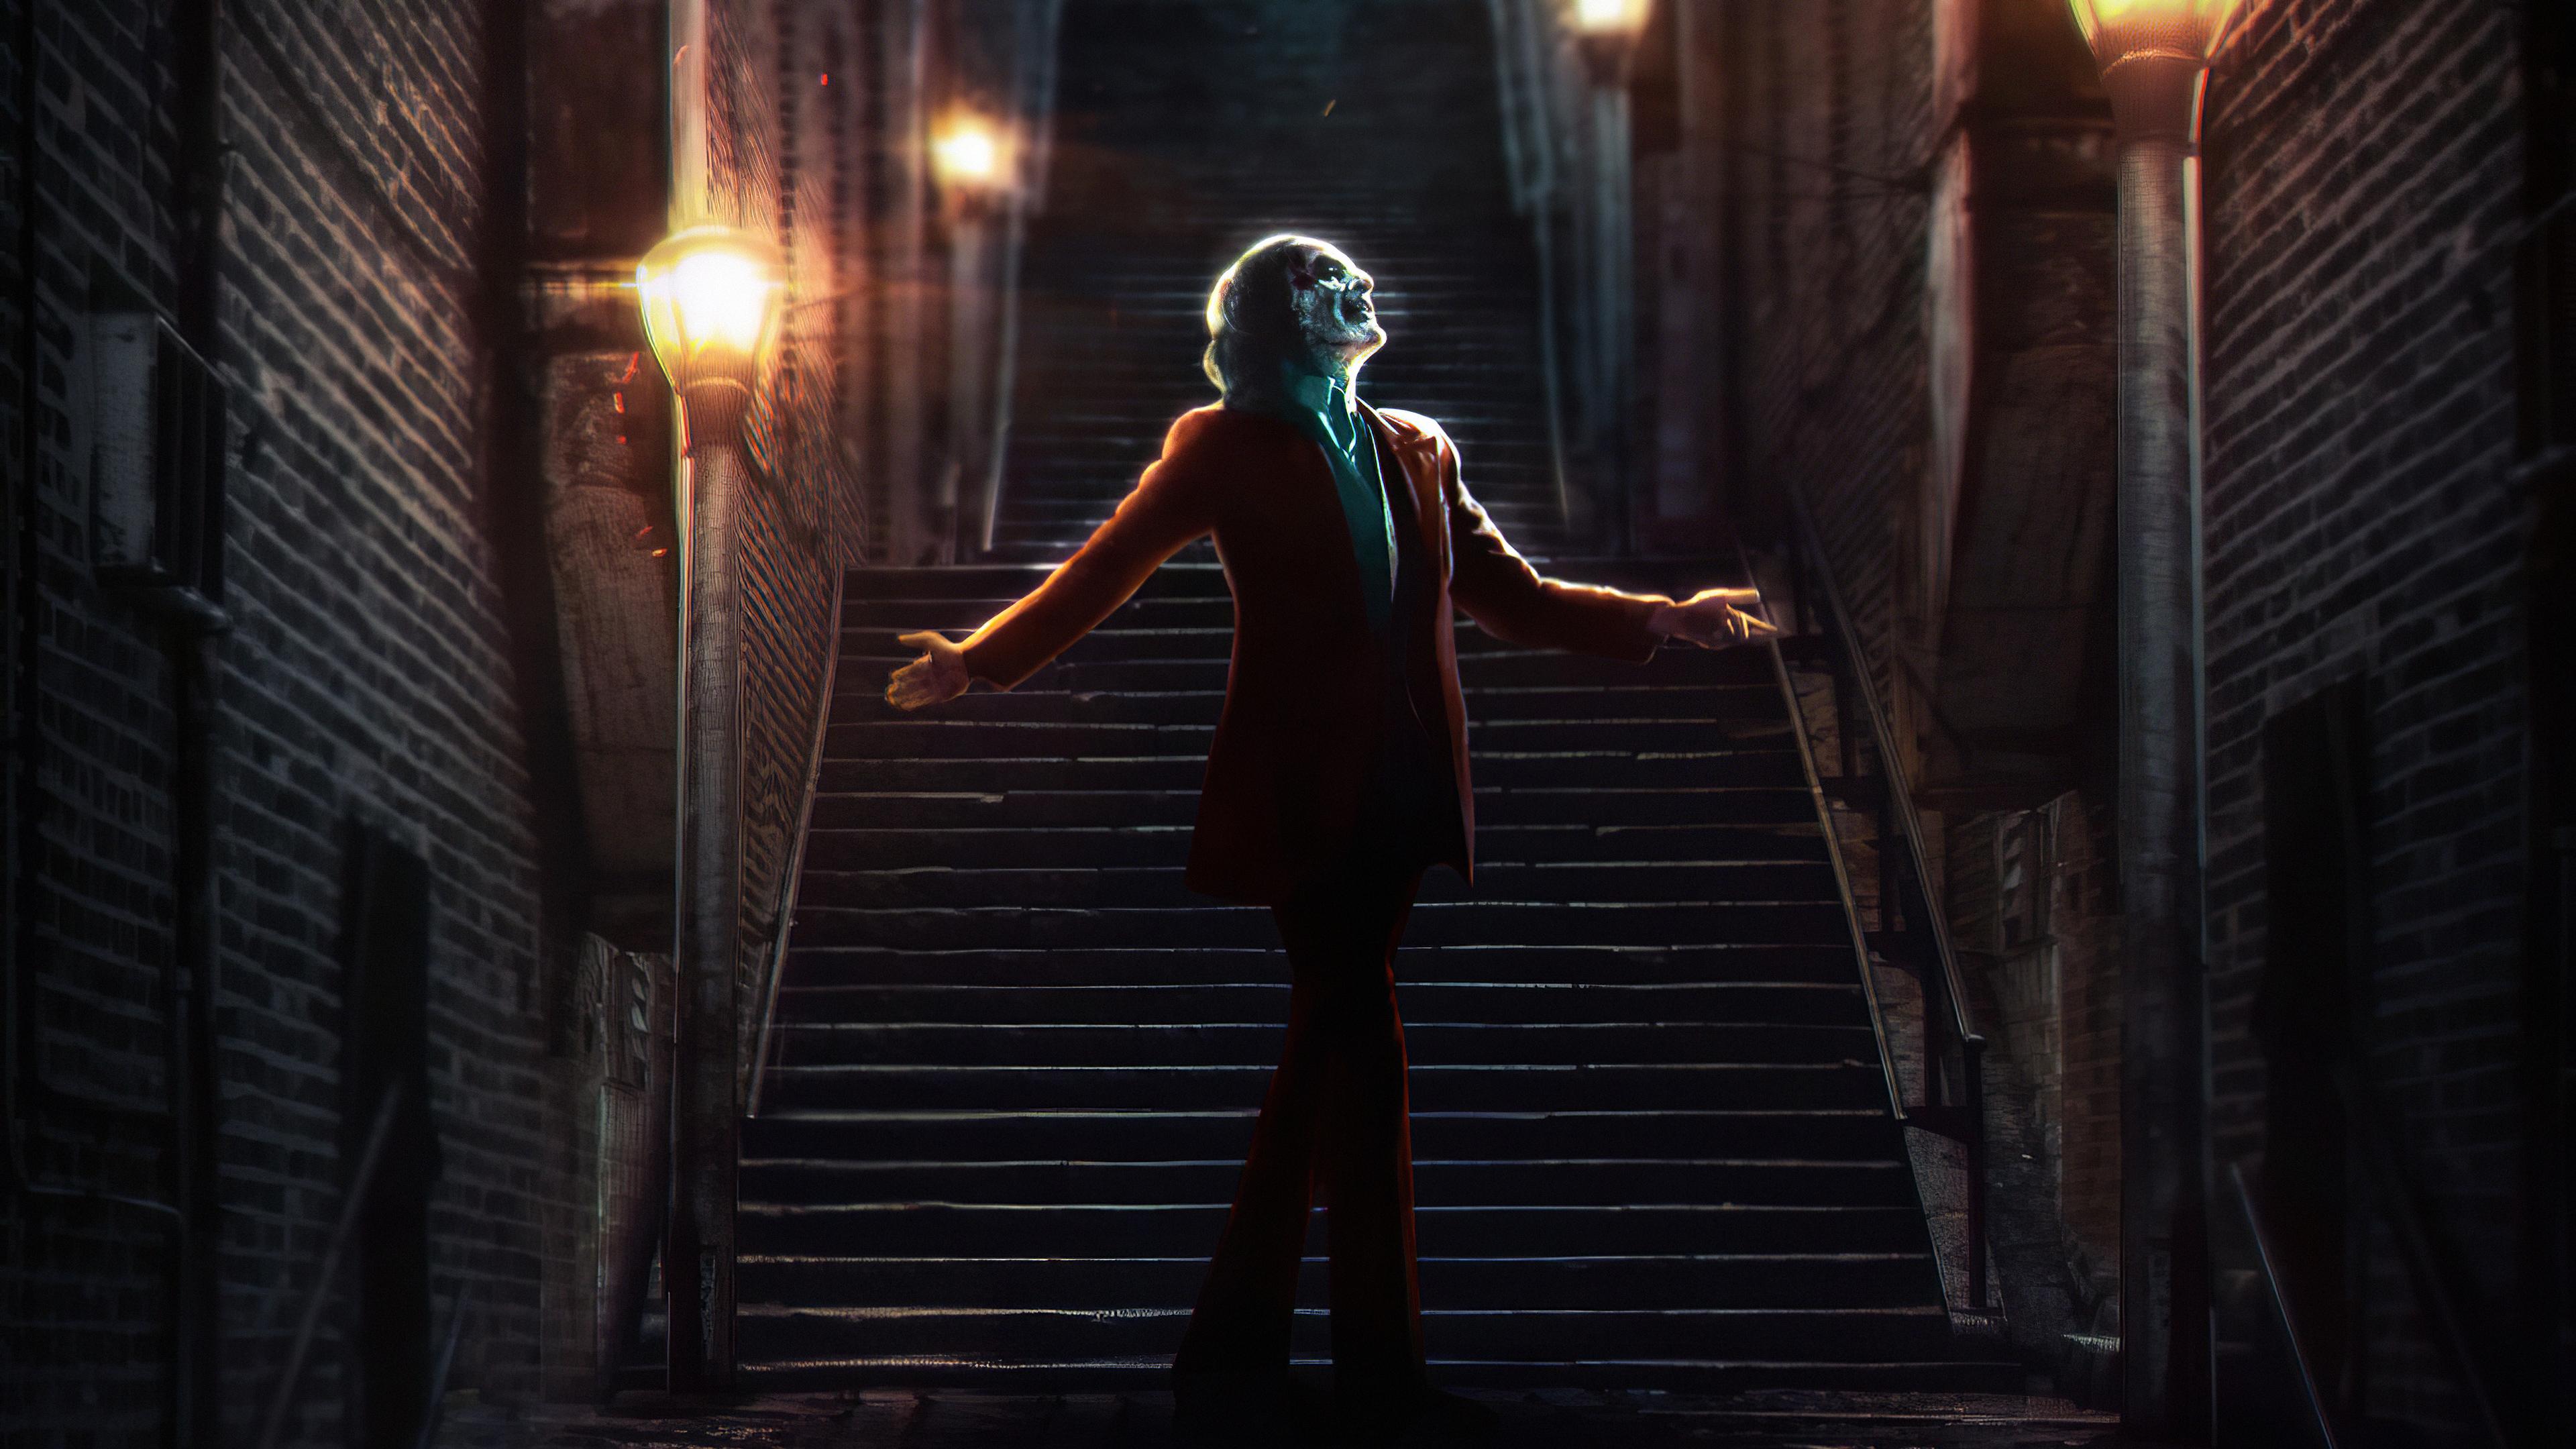 Joker 2019 4k, HD Movies, 4k Wallpapers, Images ...